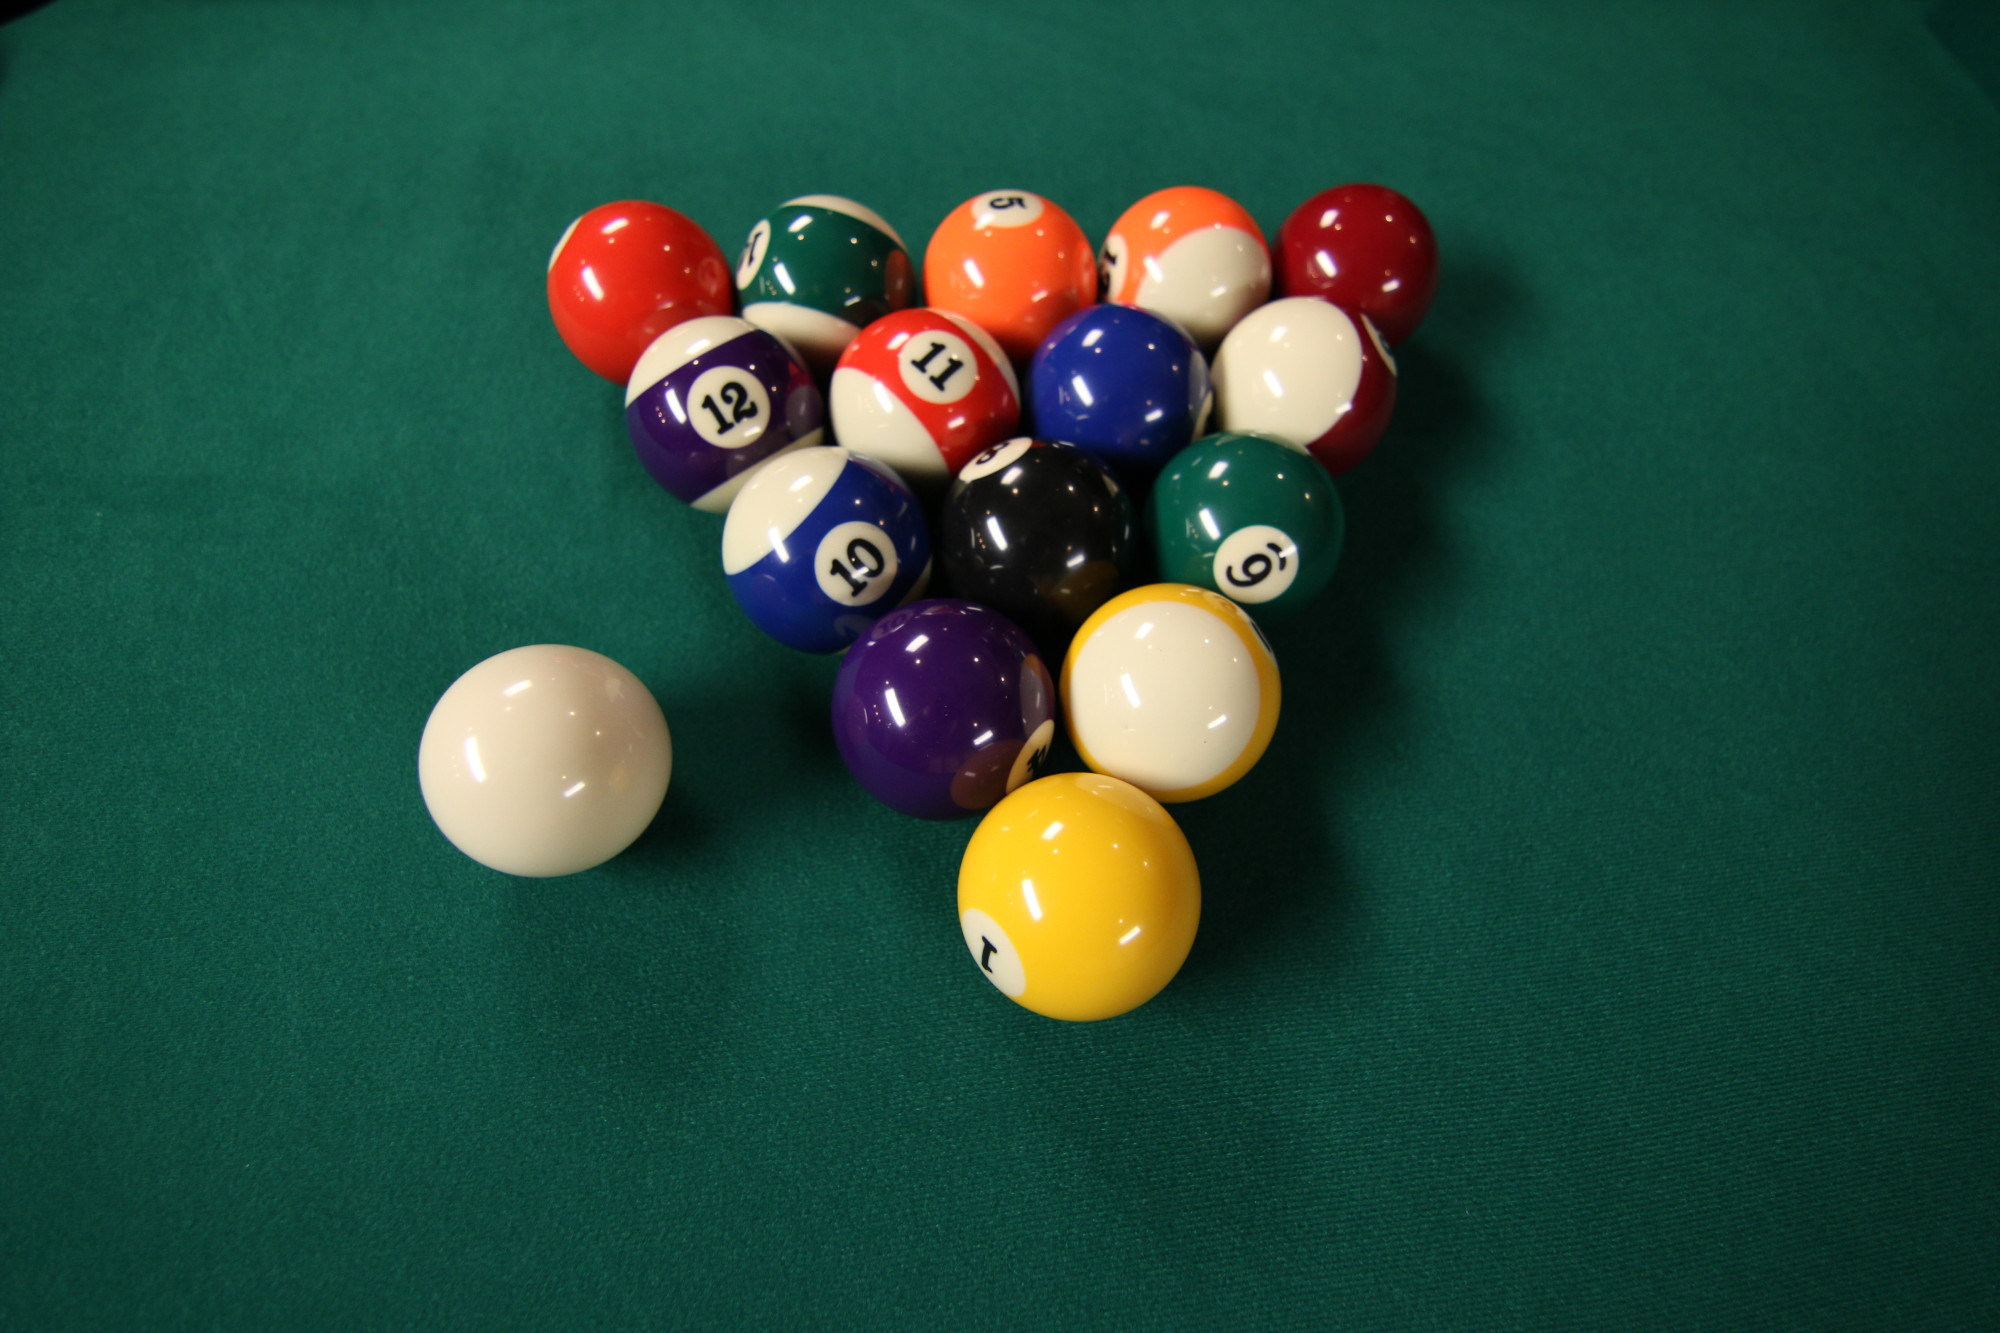 Mizerak Dynasty Space Saver Billiard Table Walmartcom - Mizerak space saver pool table